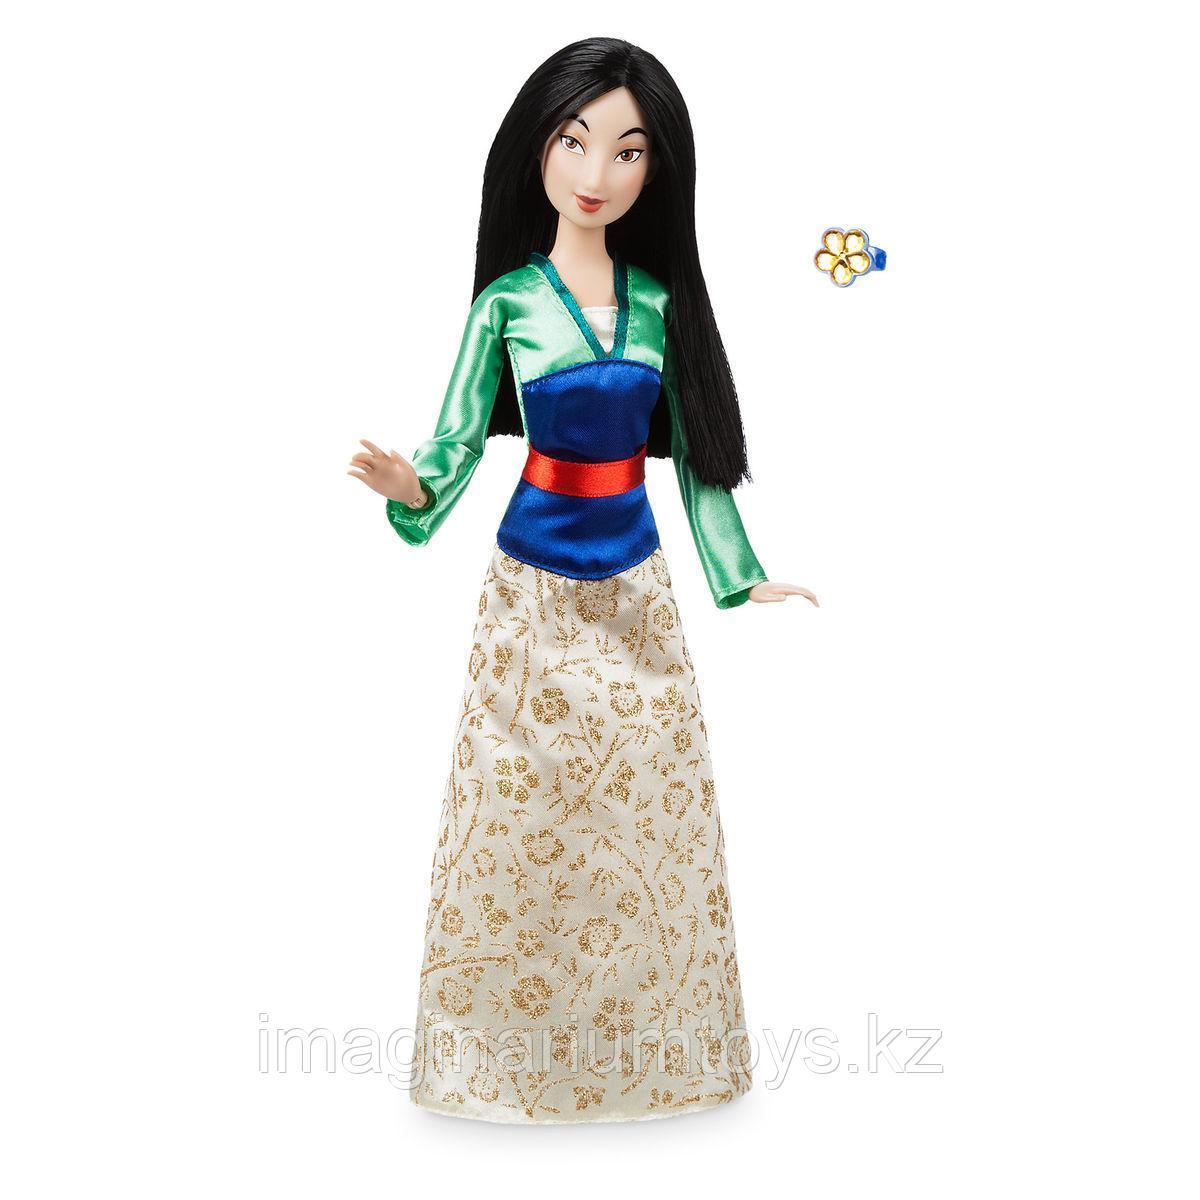 Кукла Мулан Дисней - фото 1